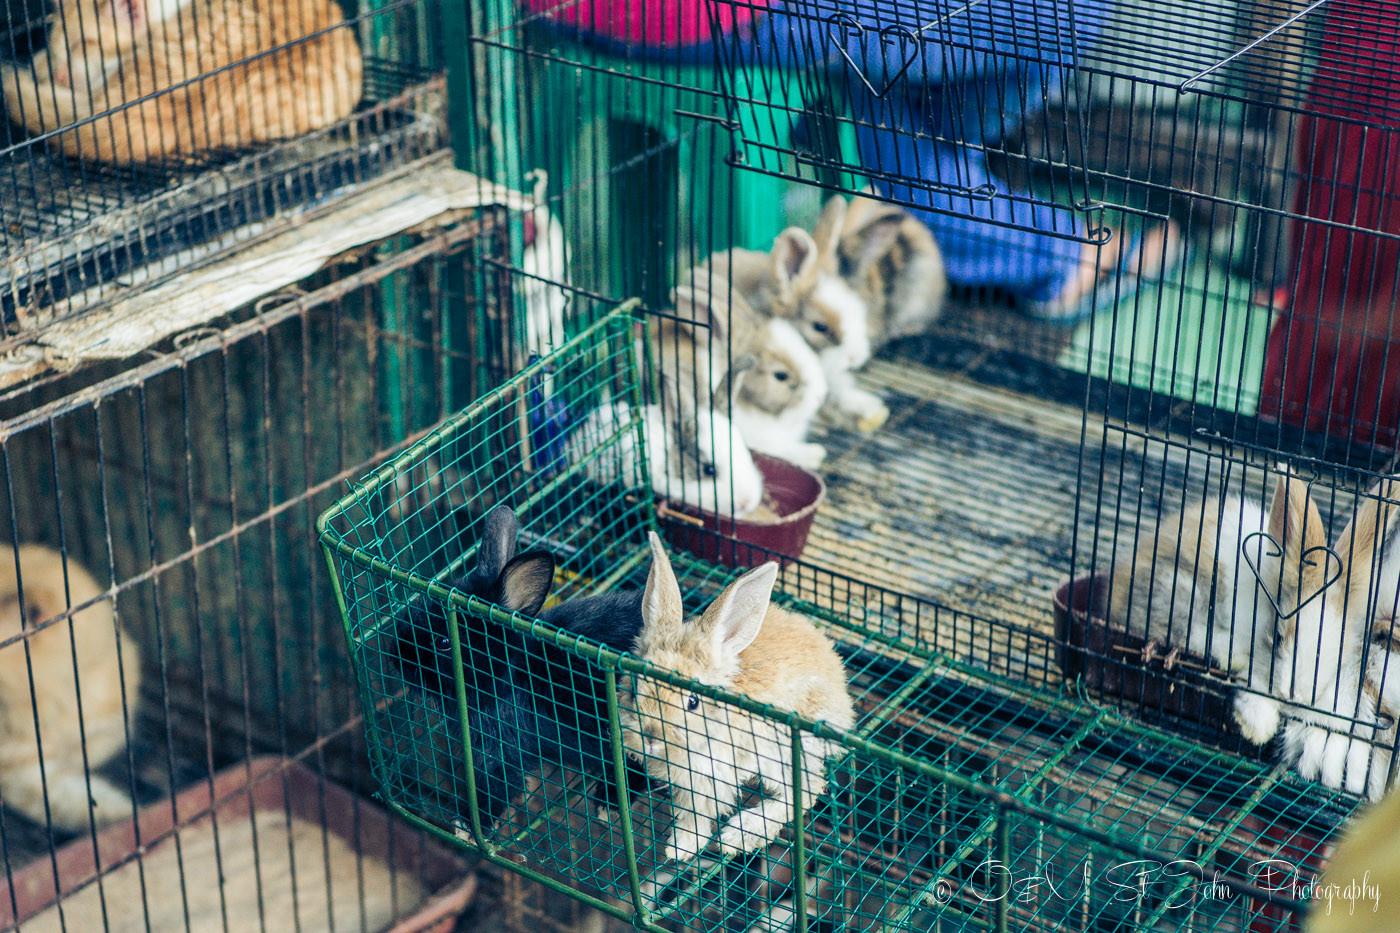 Bunnies at the Malang Bird Market, East Java, Indonesia